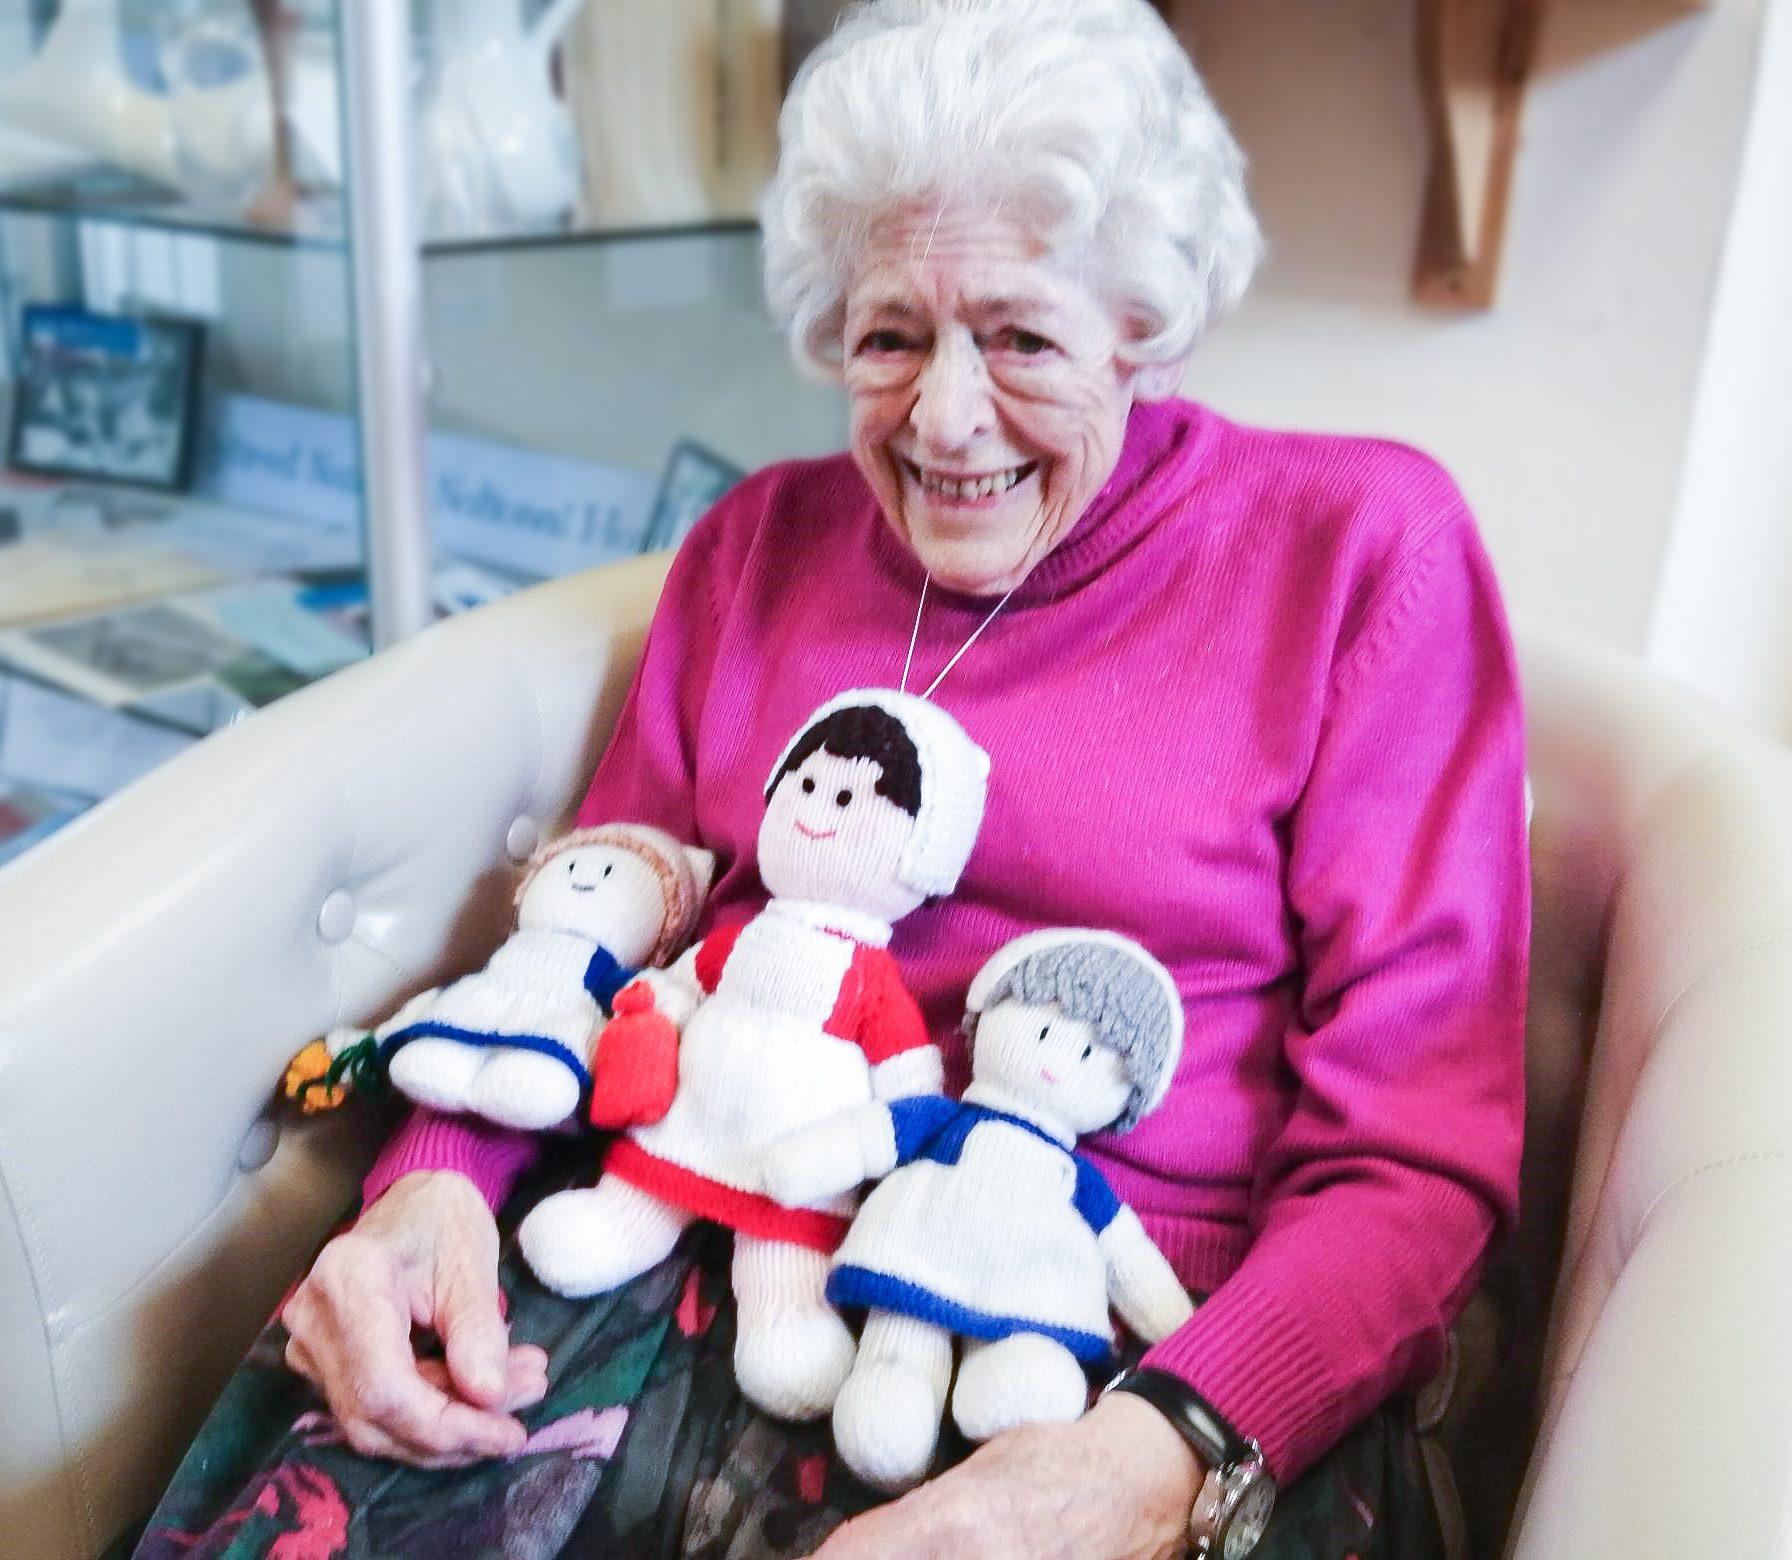 RNNH care home resident with nurse dolls on International Nurses Day